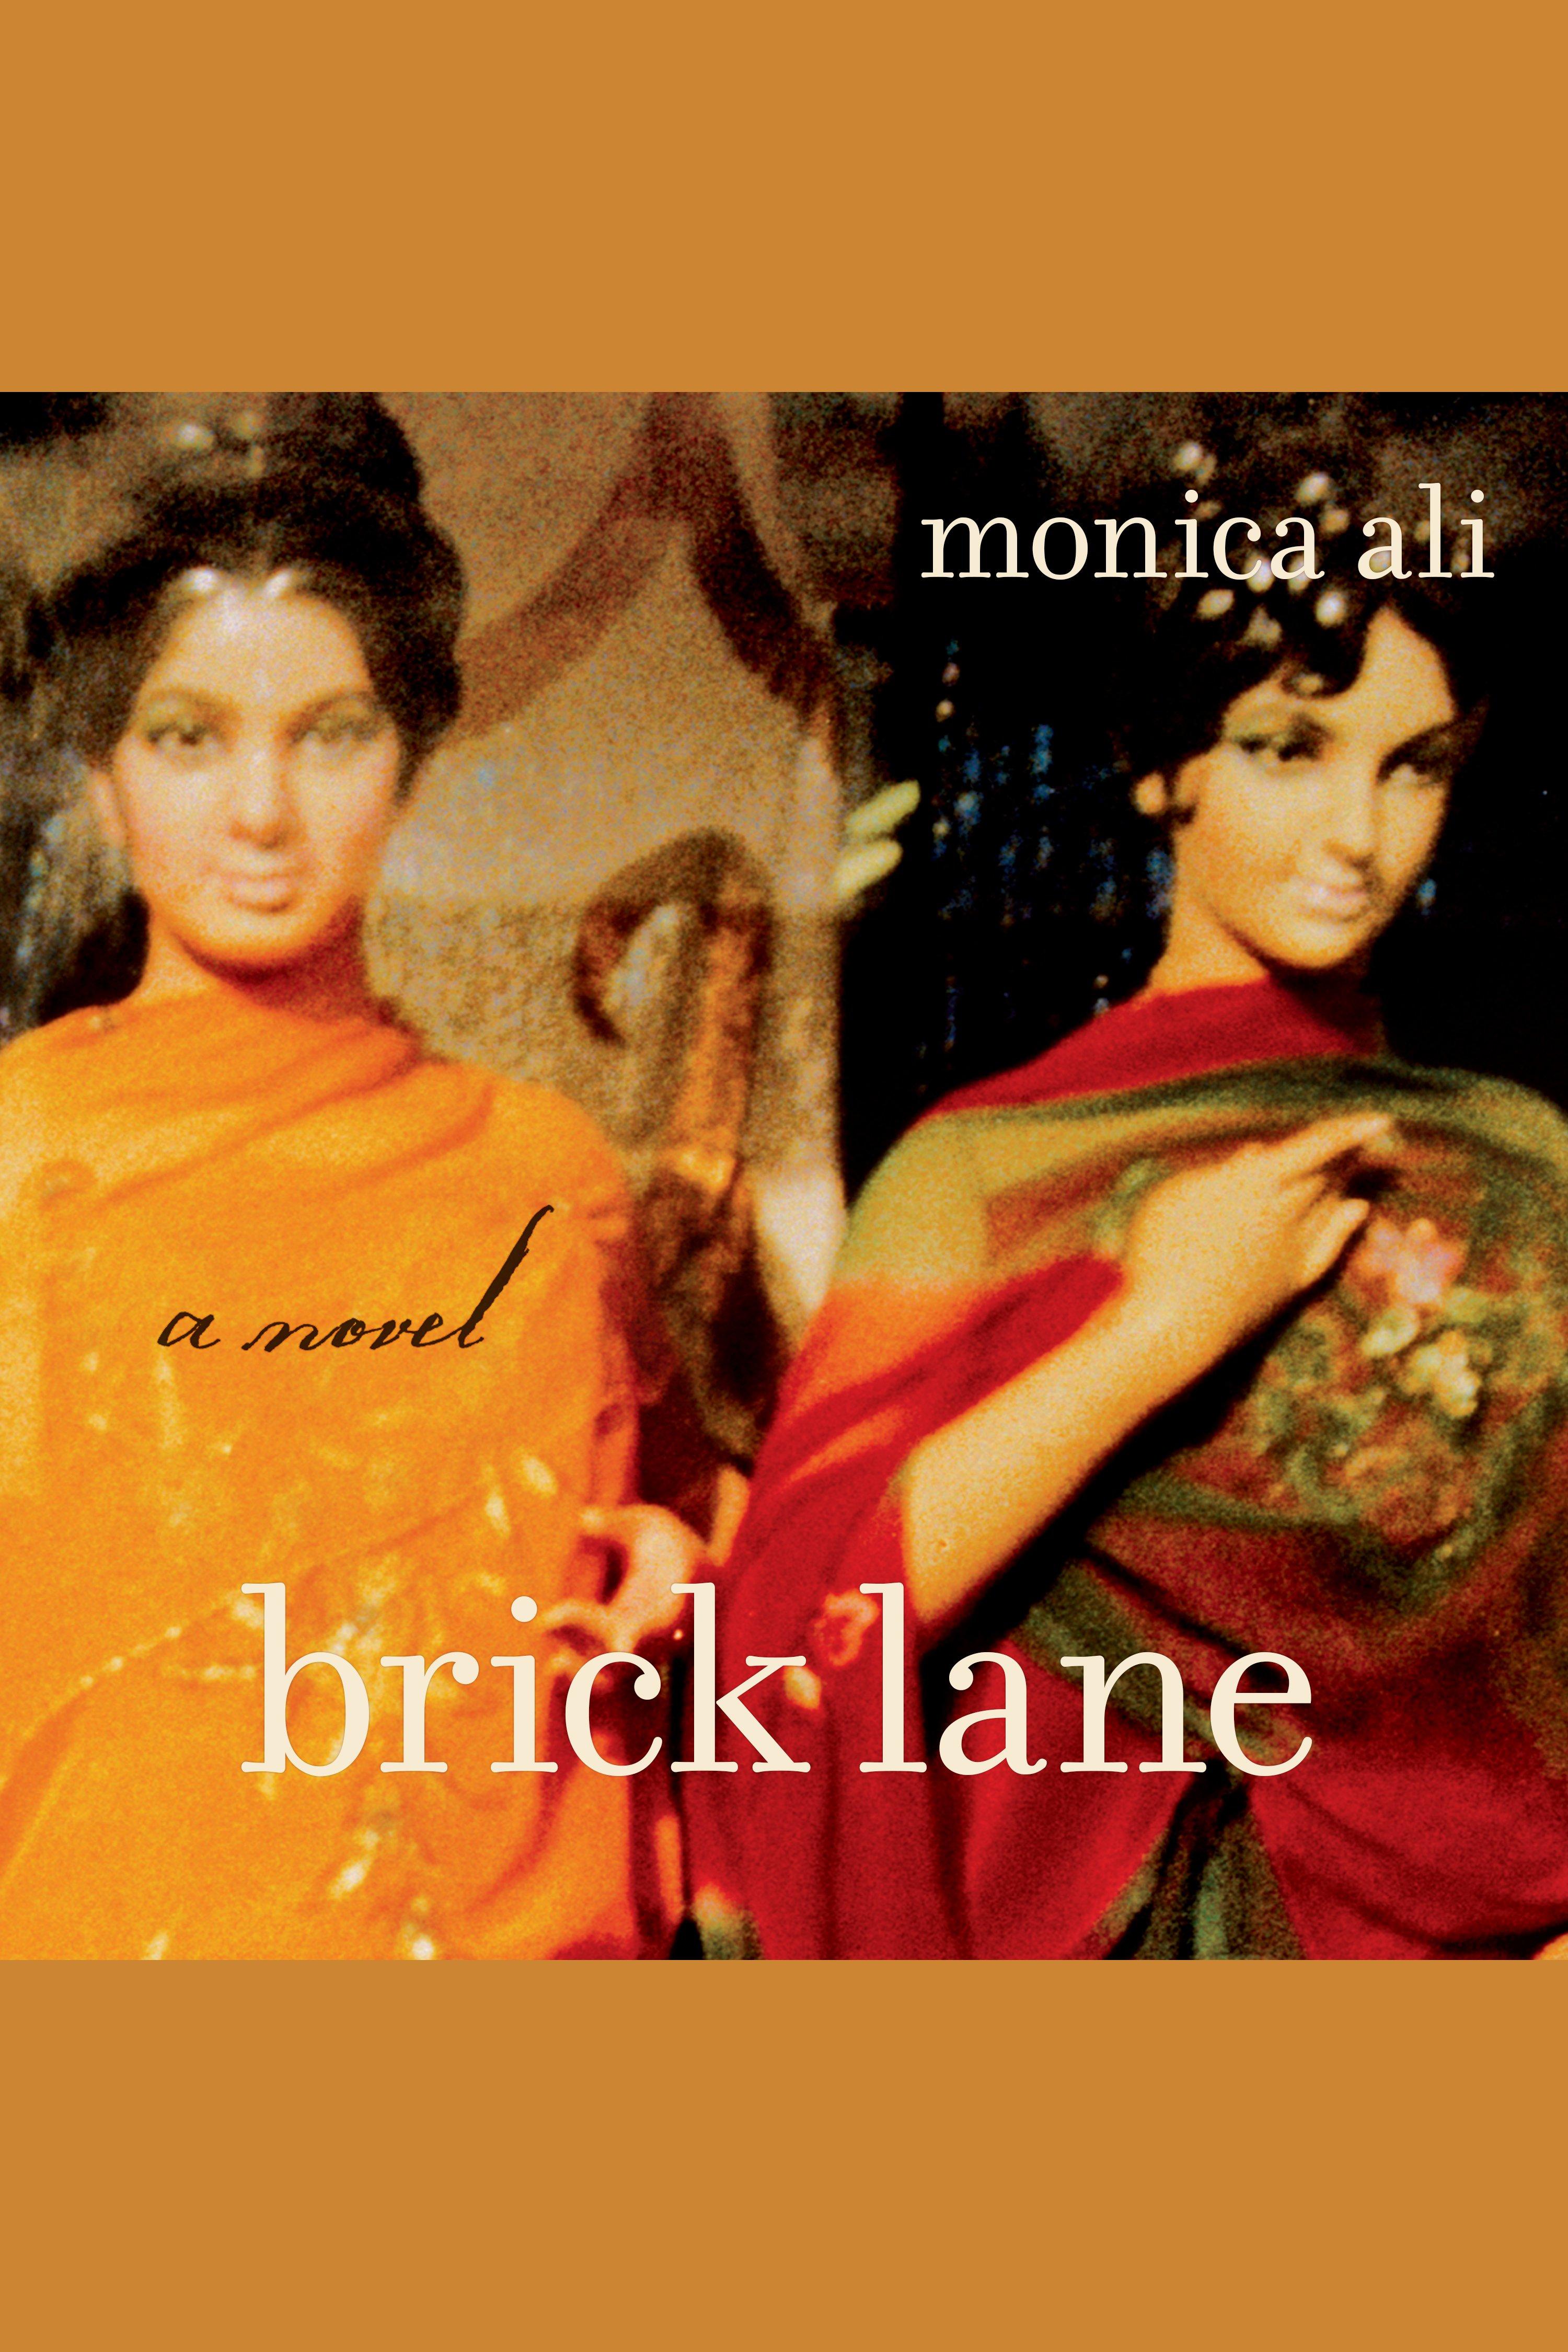 Cover Image of Brick Lane